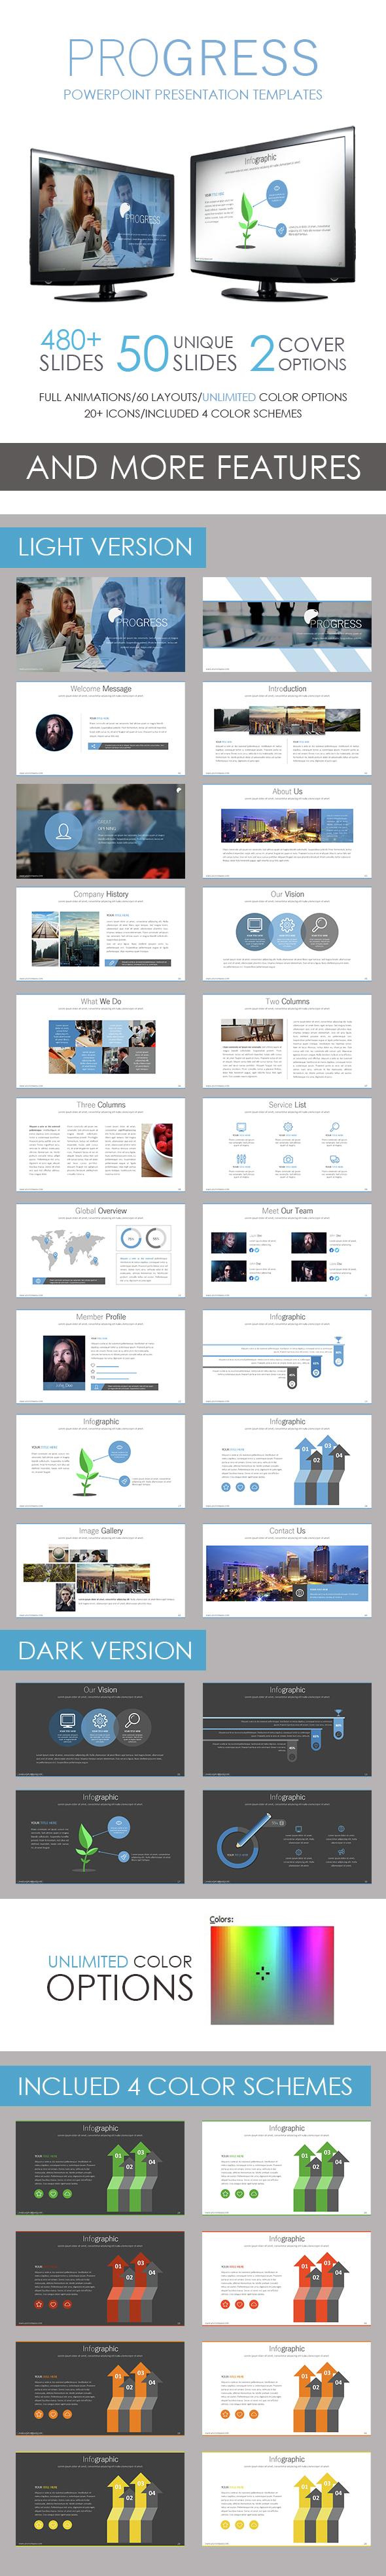 Progress PowerPoint Template - Business PowerPoint Templates